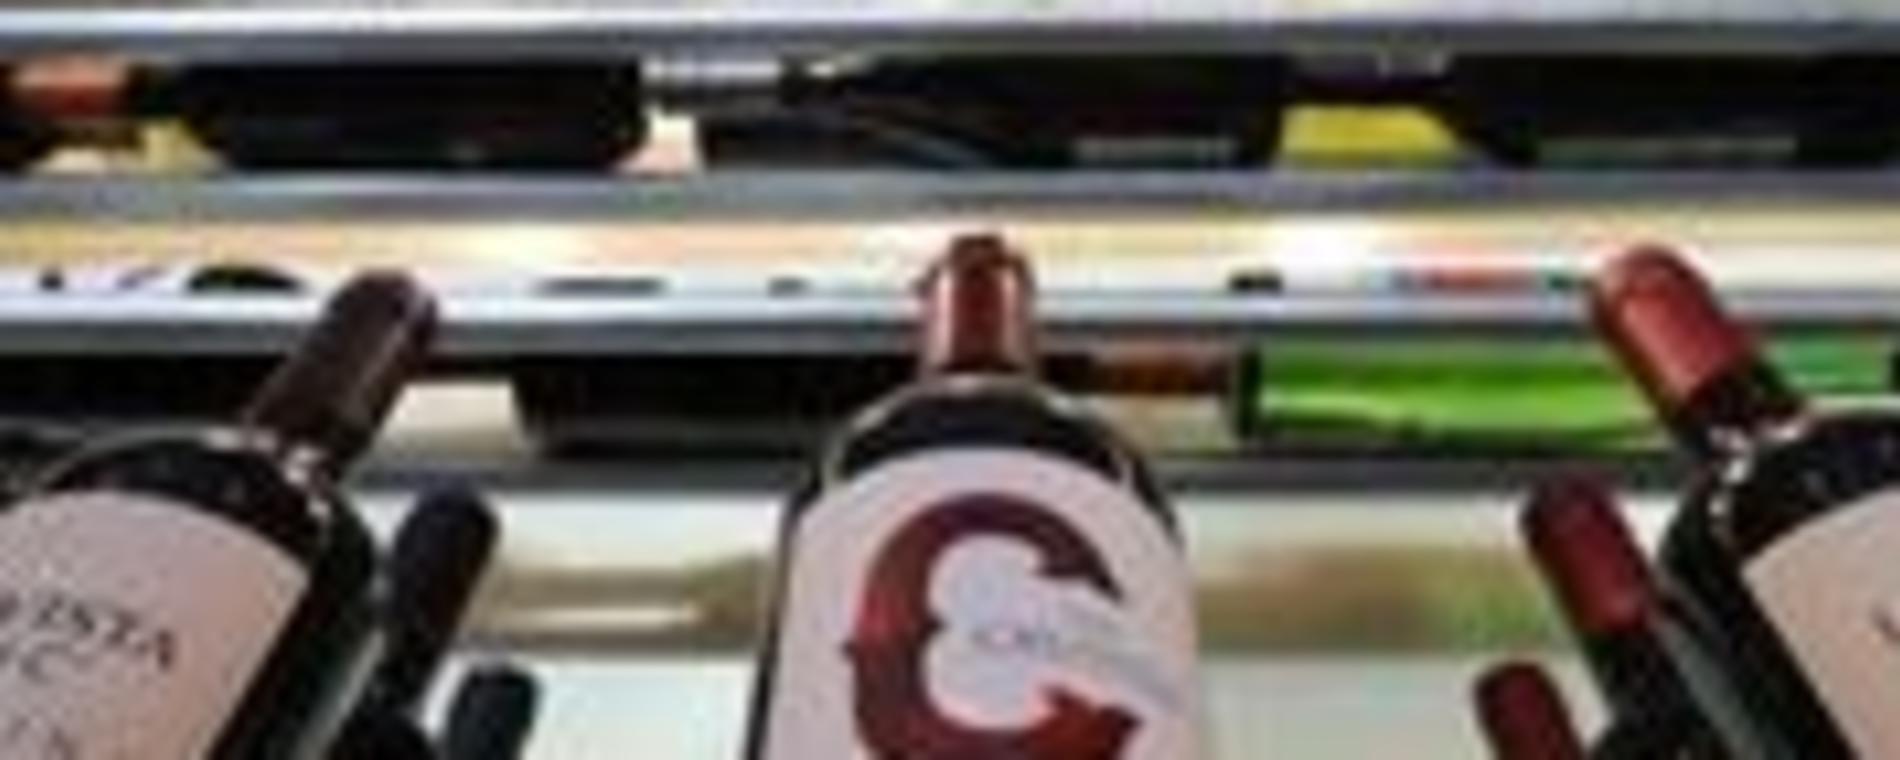 Sabor bottles of wine Visit Wichita